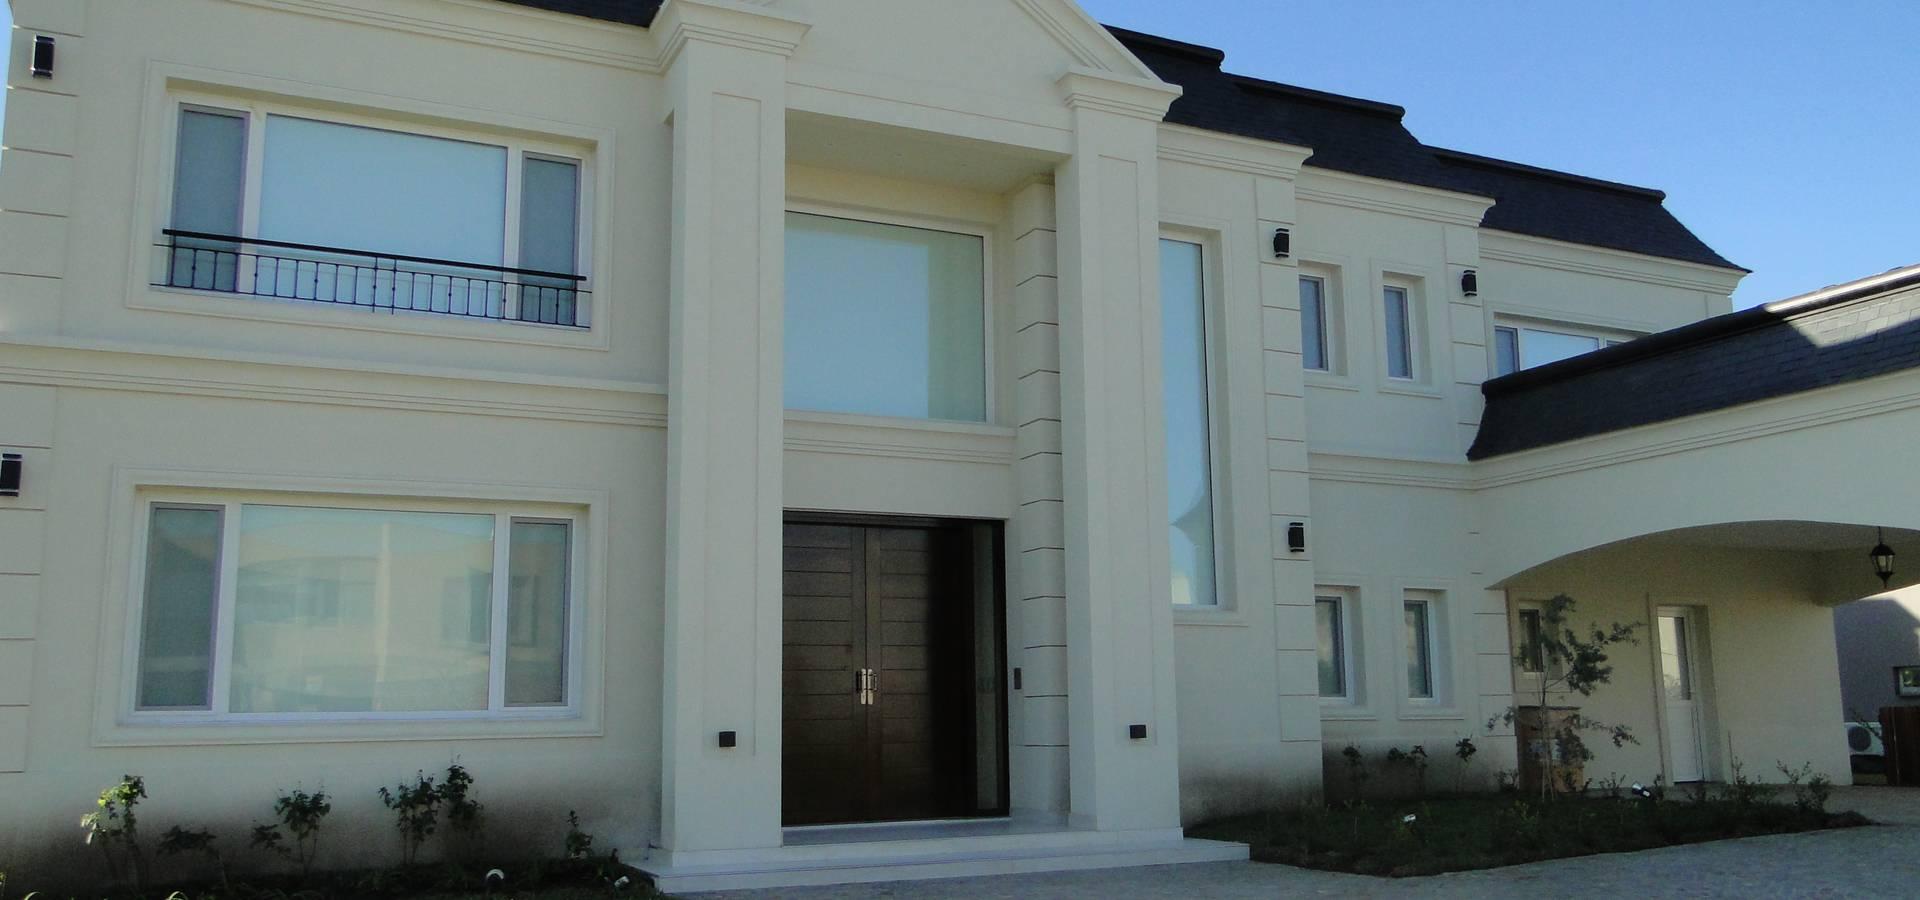 Arquitectos Building M&CC – (Marcelo Rueda, Claudio Castiglia y Claudia Rueda)